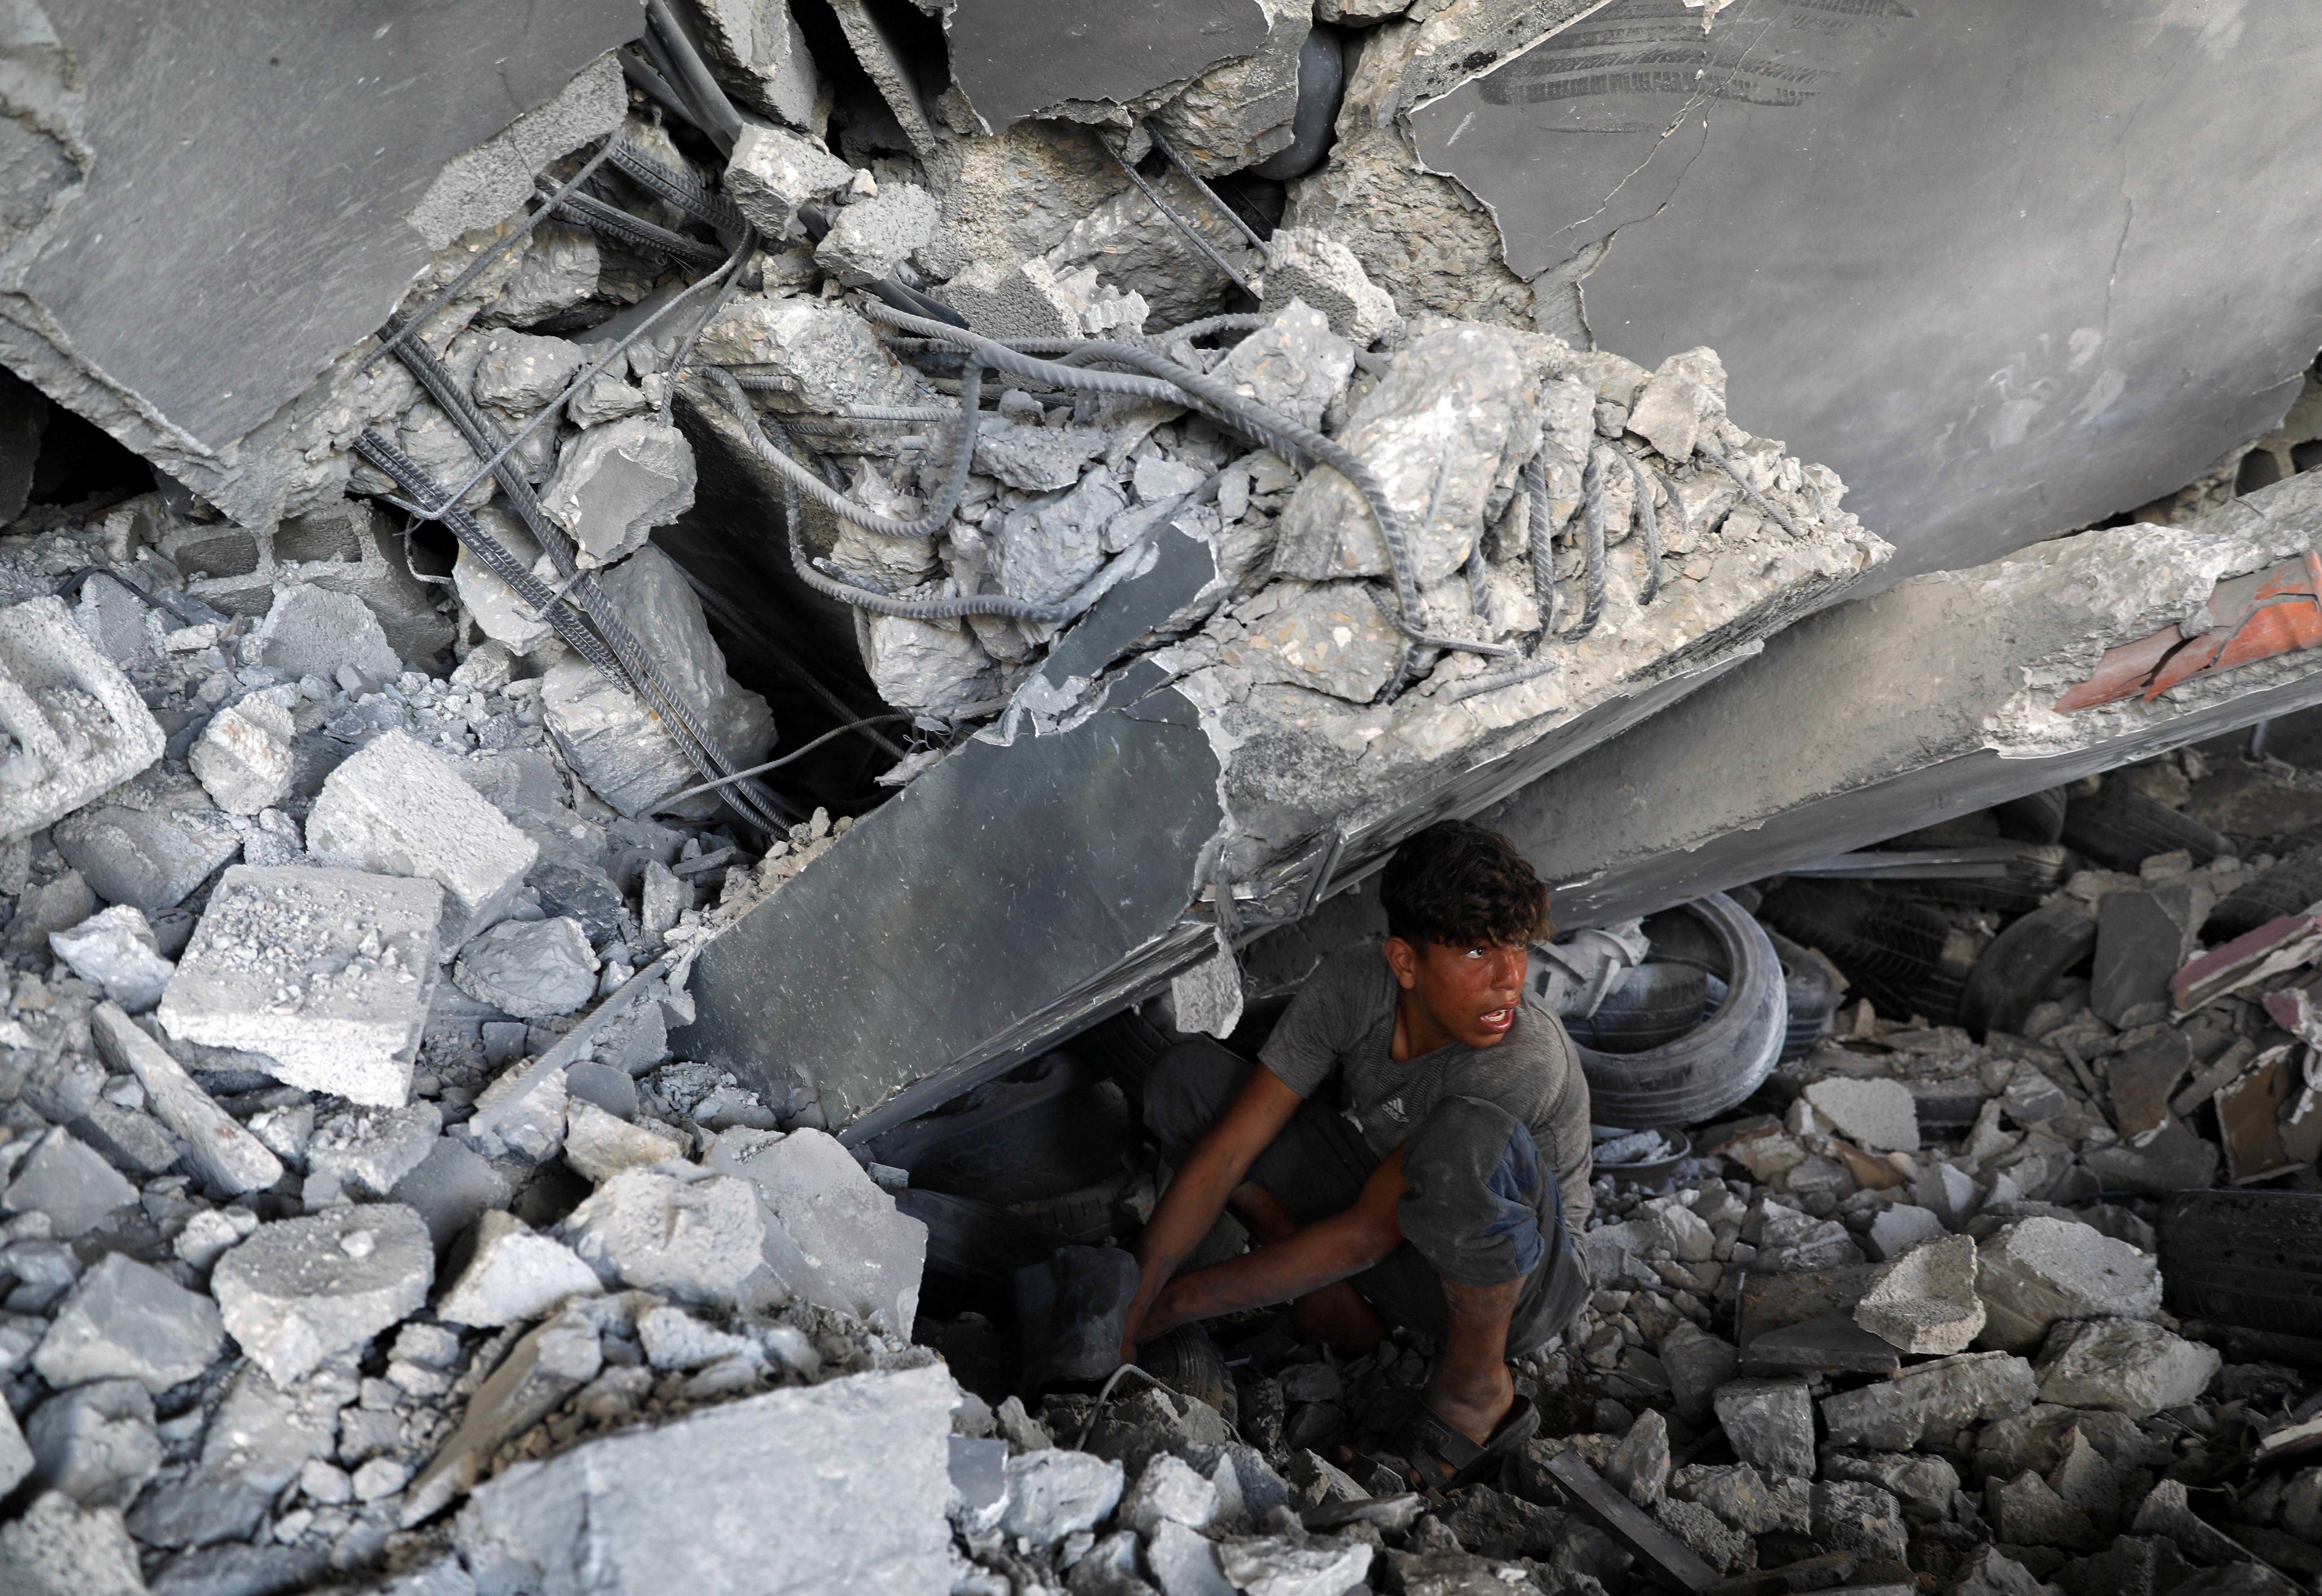 A boy squats in building rubble